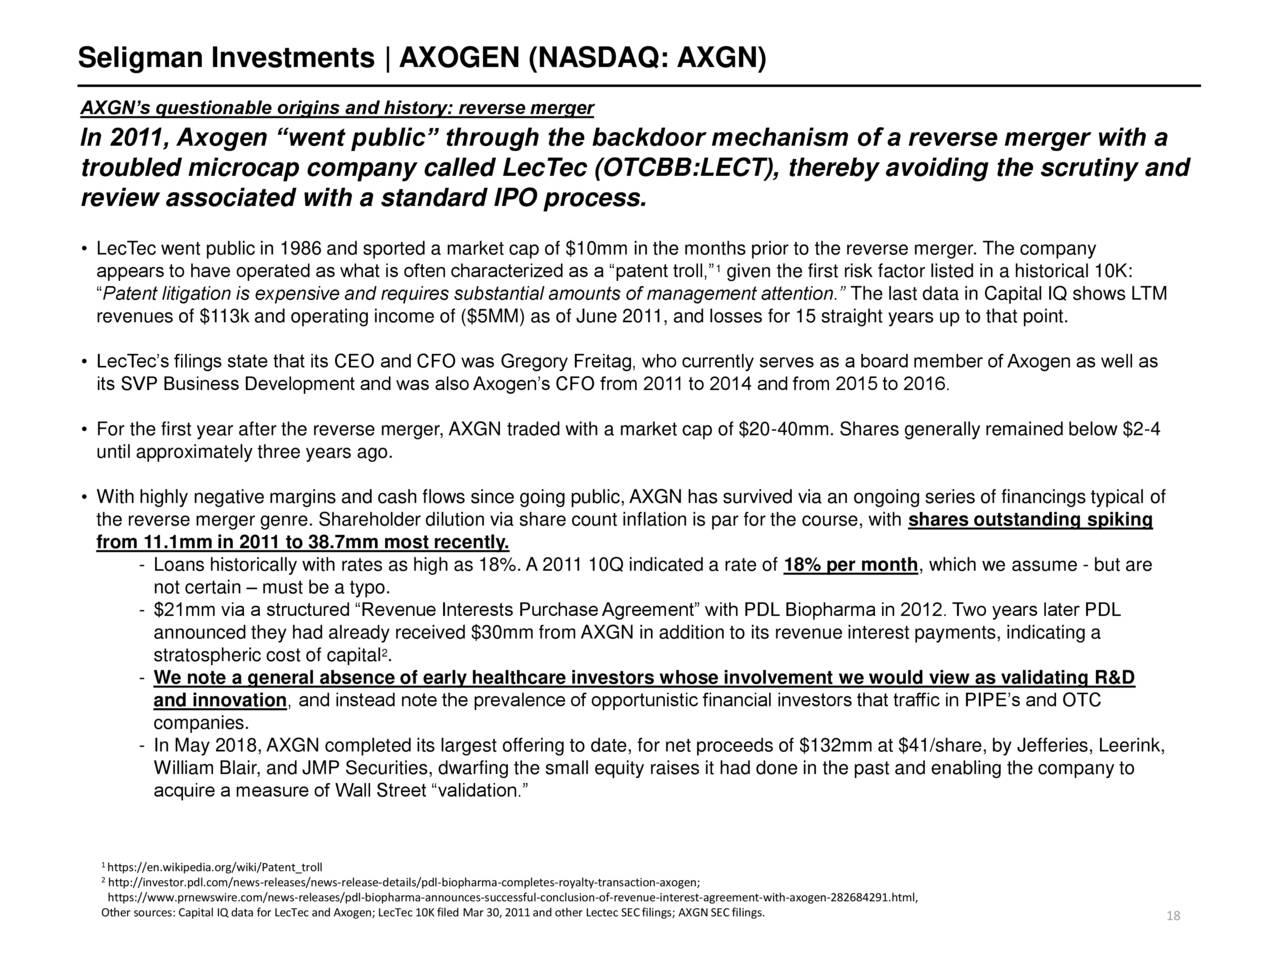 AxoGen: An Overhyped, Cash-Burning Reverse Merger At 12x Revenue